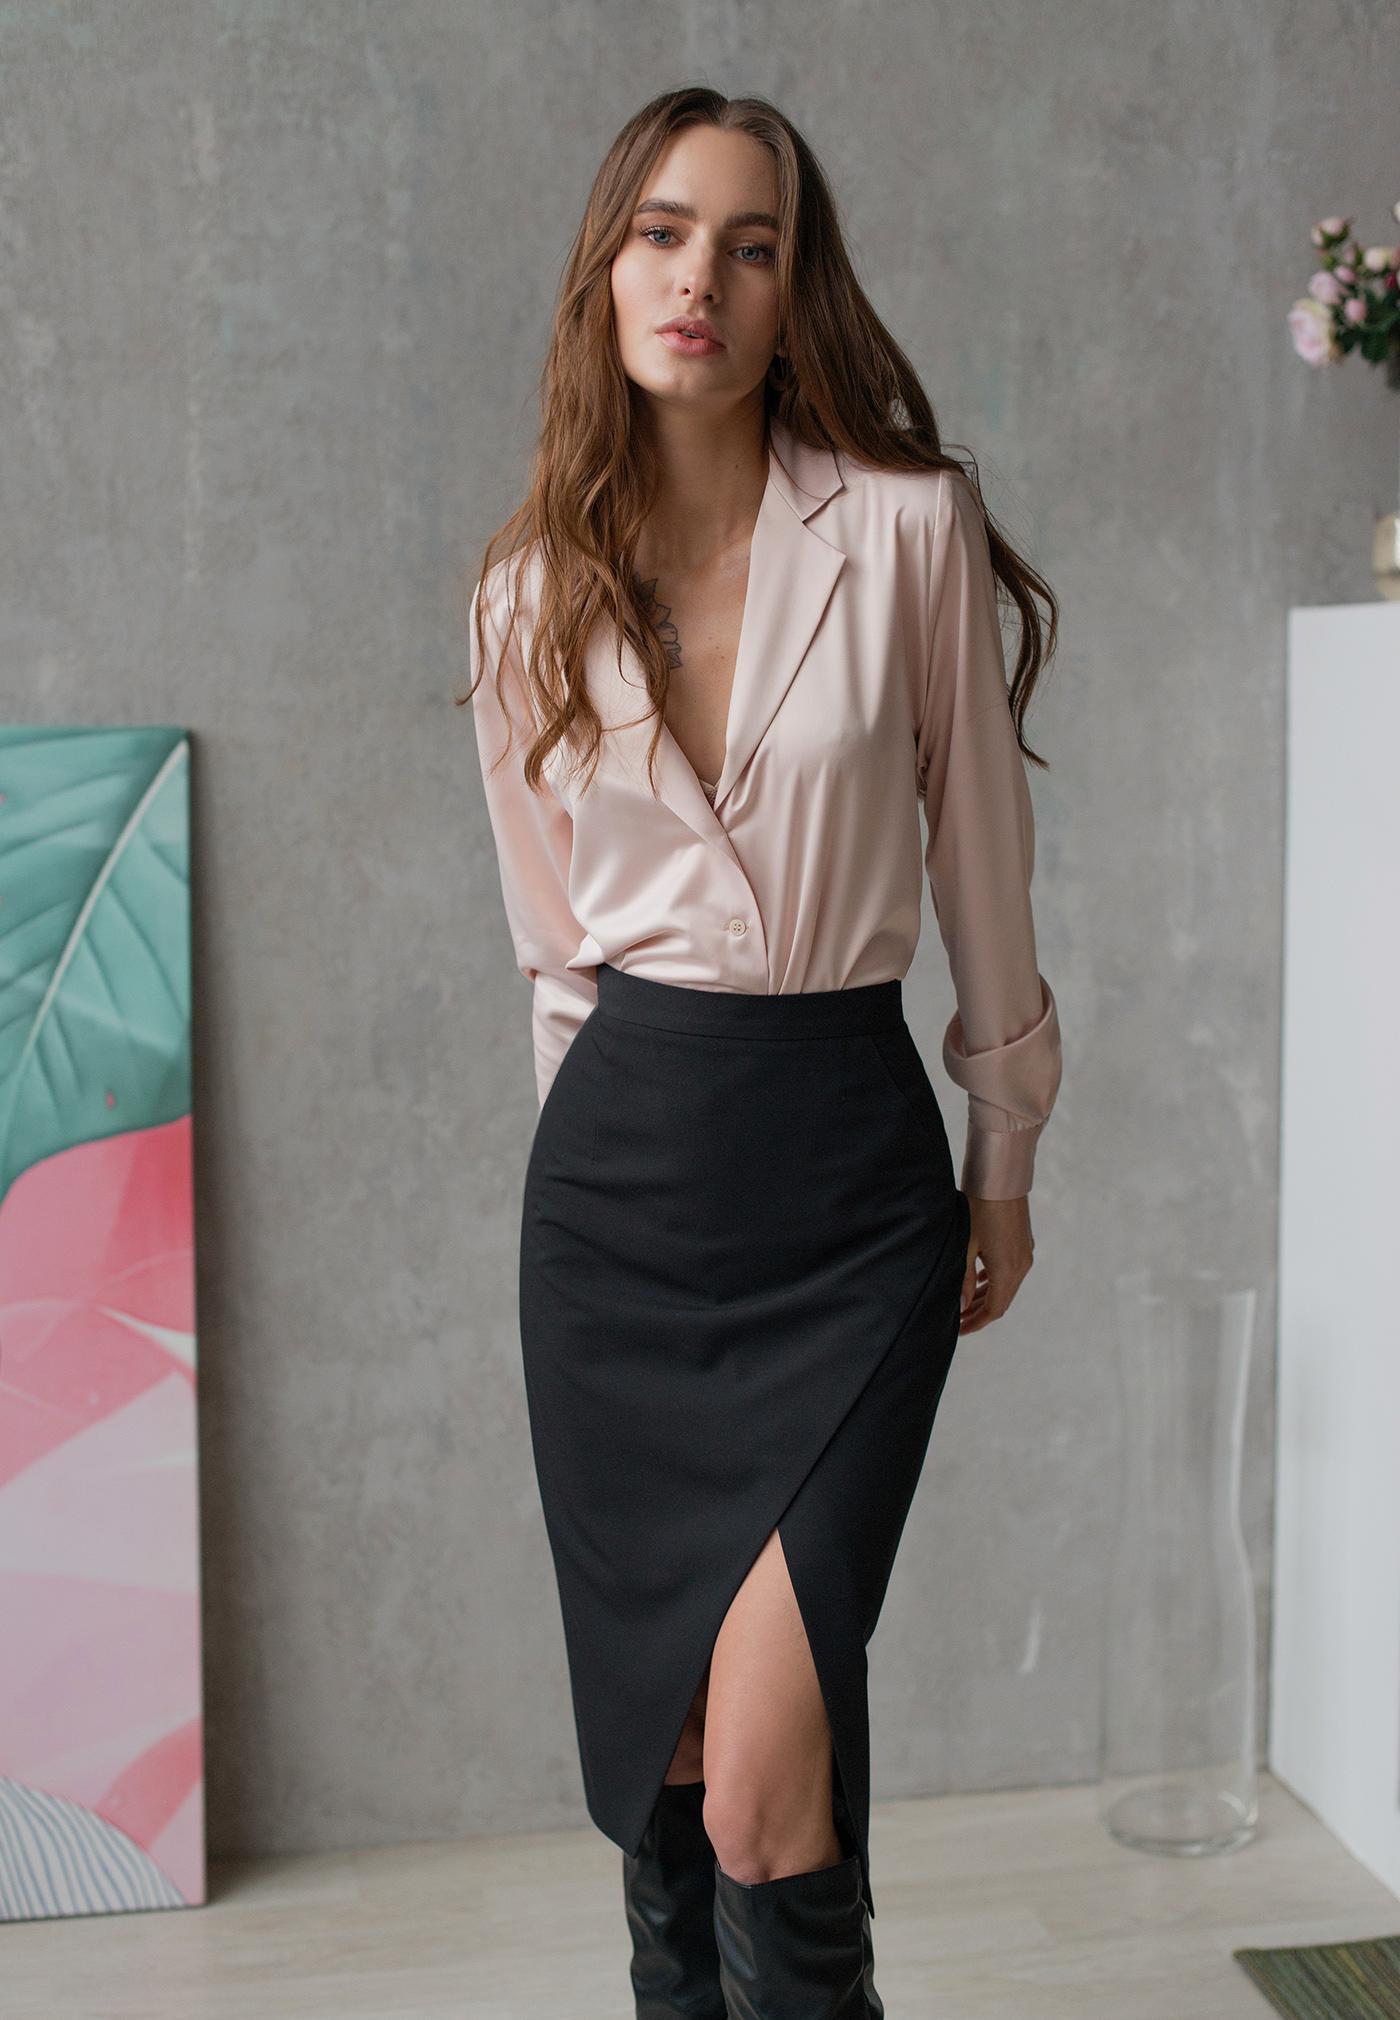 Image may contain: wall, skirt and dress